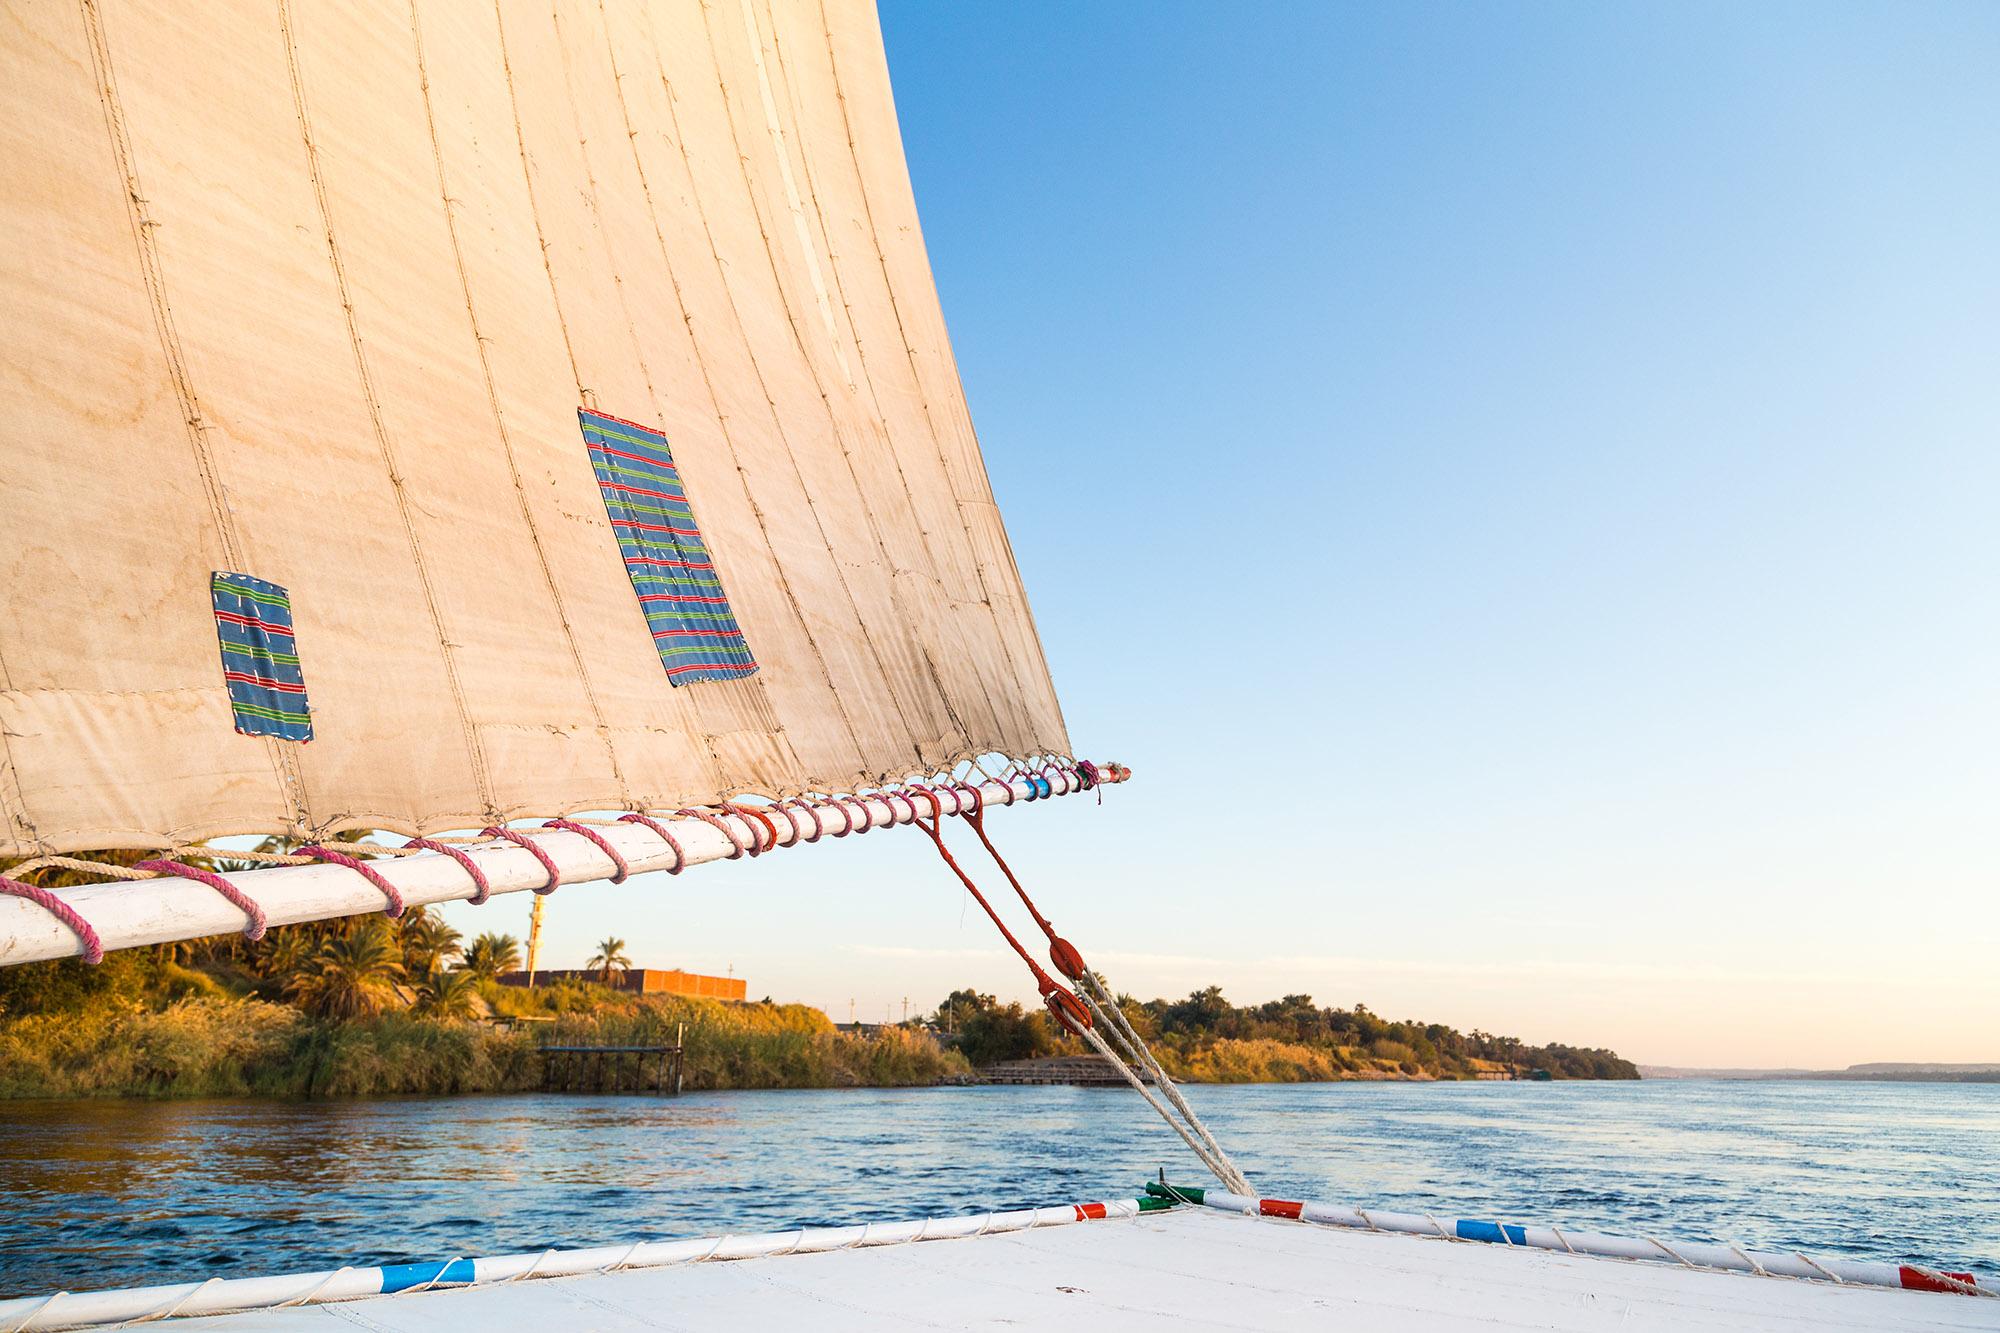 Nile River & Pharaohs by Nile Cruisefrom 540 USD - 8 DaysCairo - Aswan - Luxor